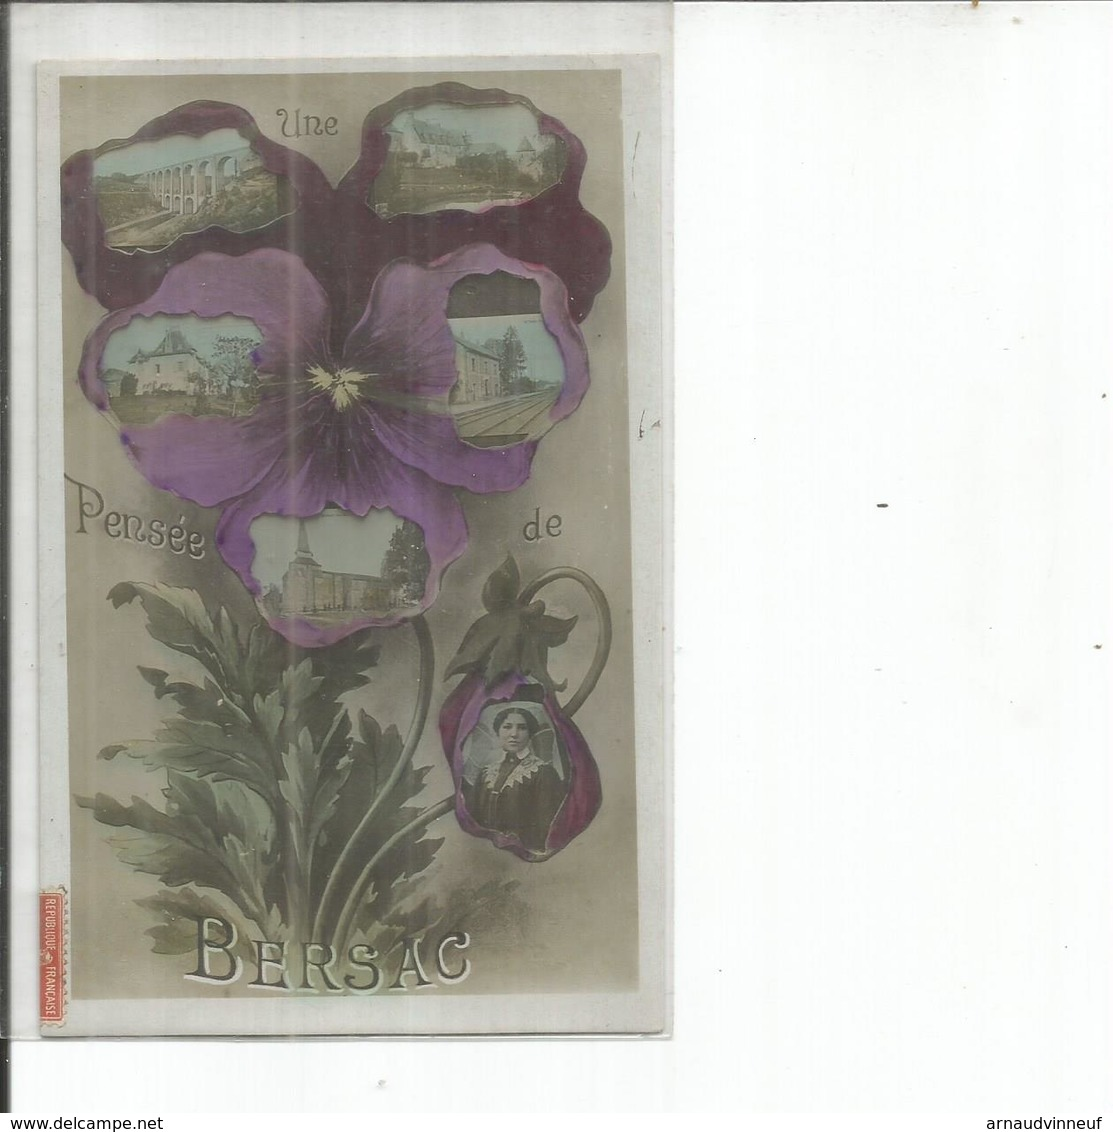 86-BERSAC UNE PENSEE DE BERSAC - France